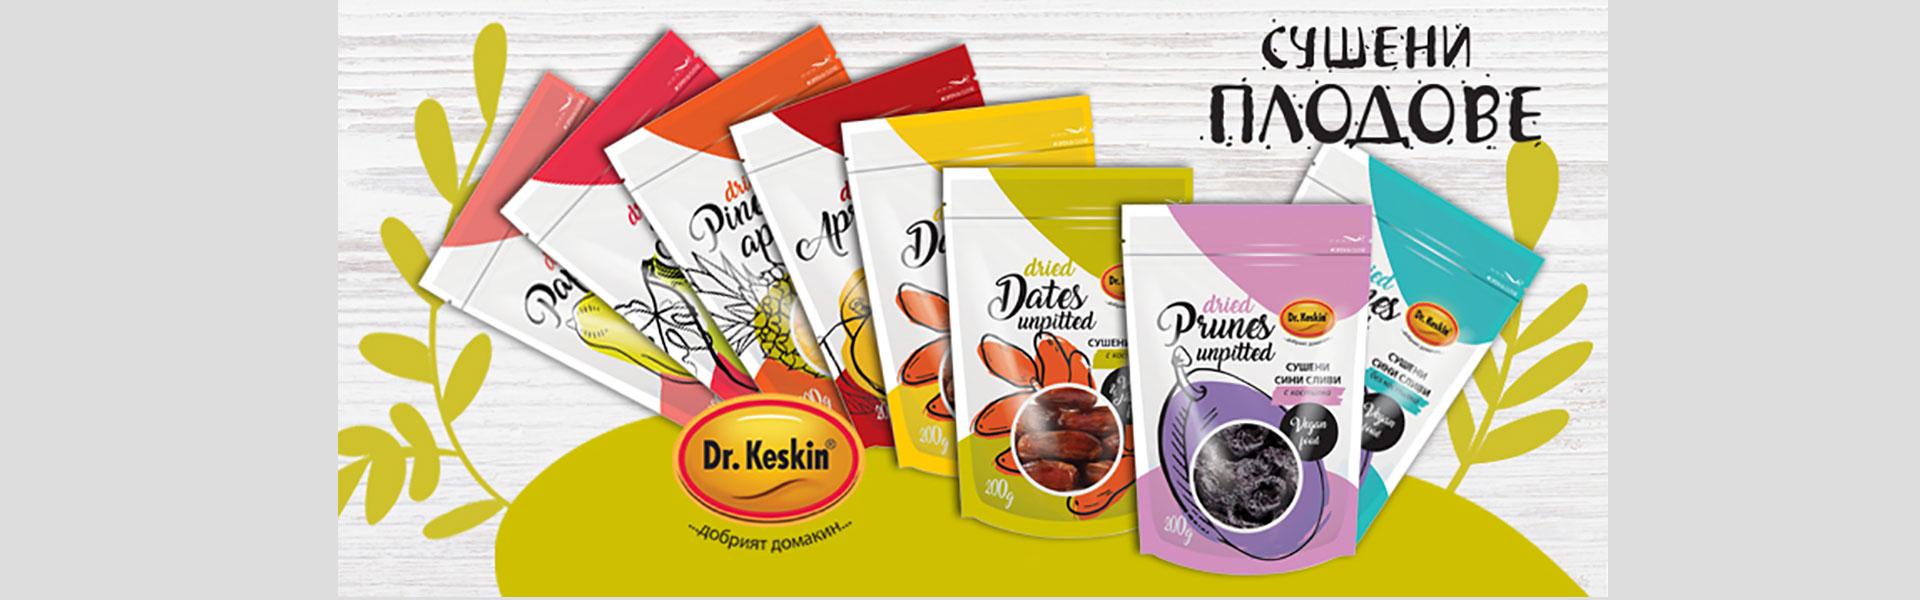 susheni-plodove-Dr-Keskin-kompyutar